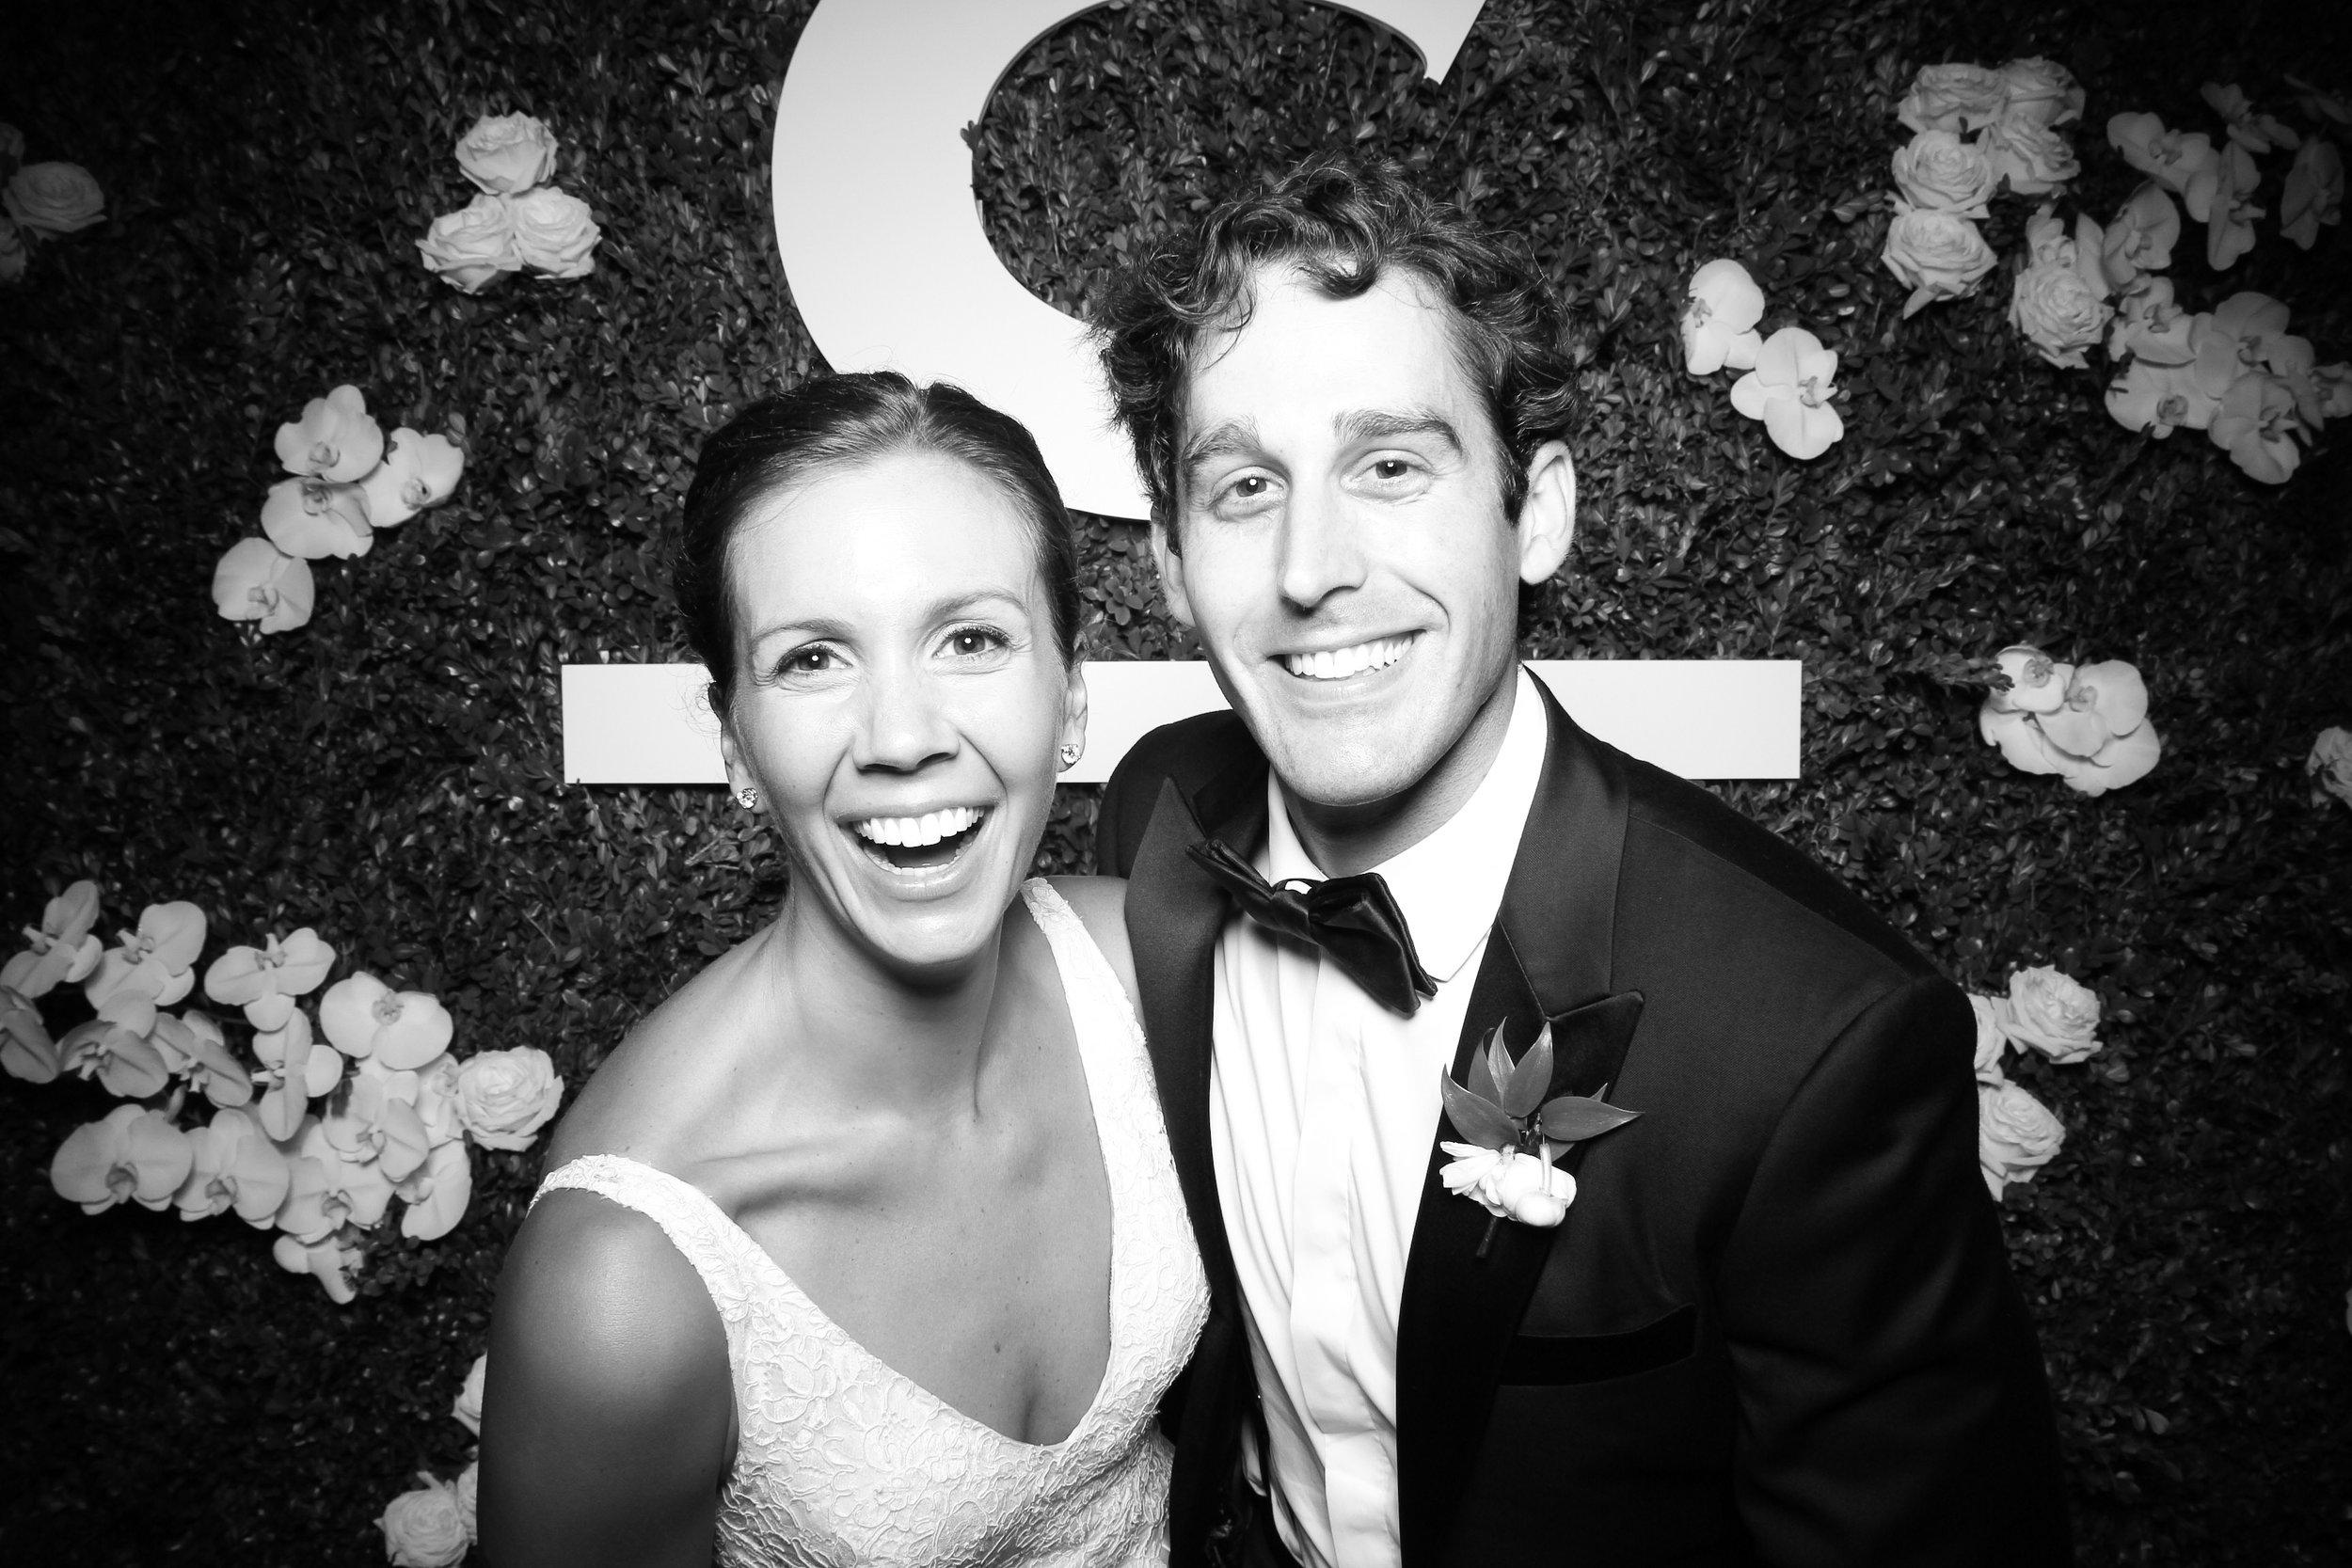 Peninsula_Hotel_Chicago_Wedding_Photo_Booth_14.jpg